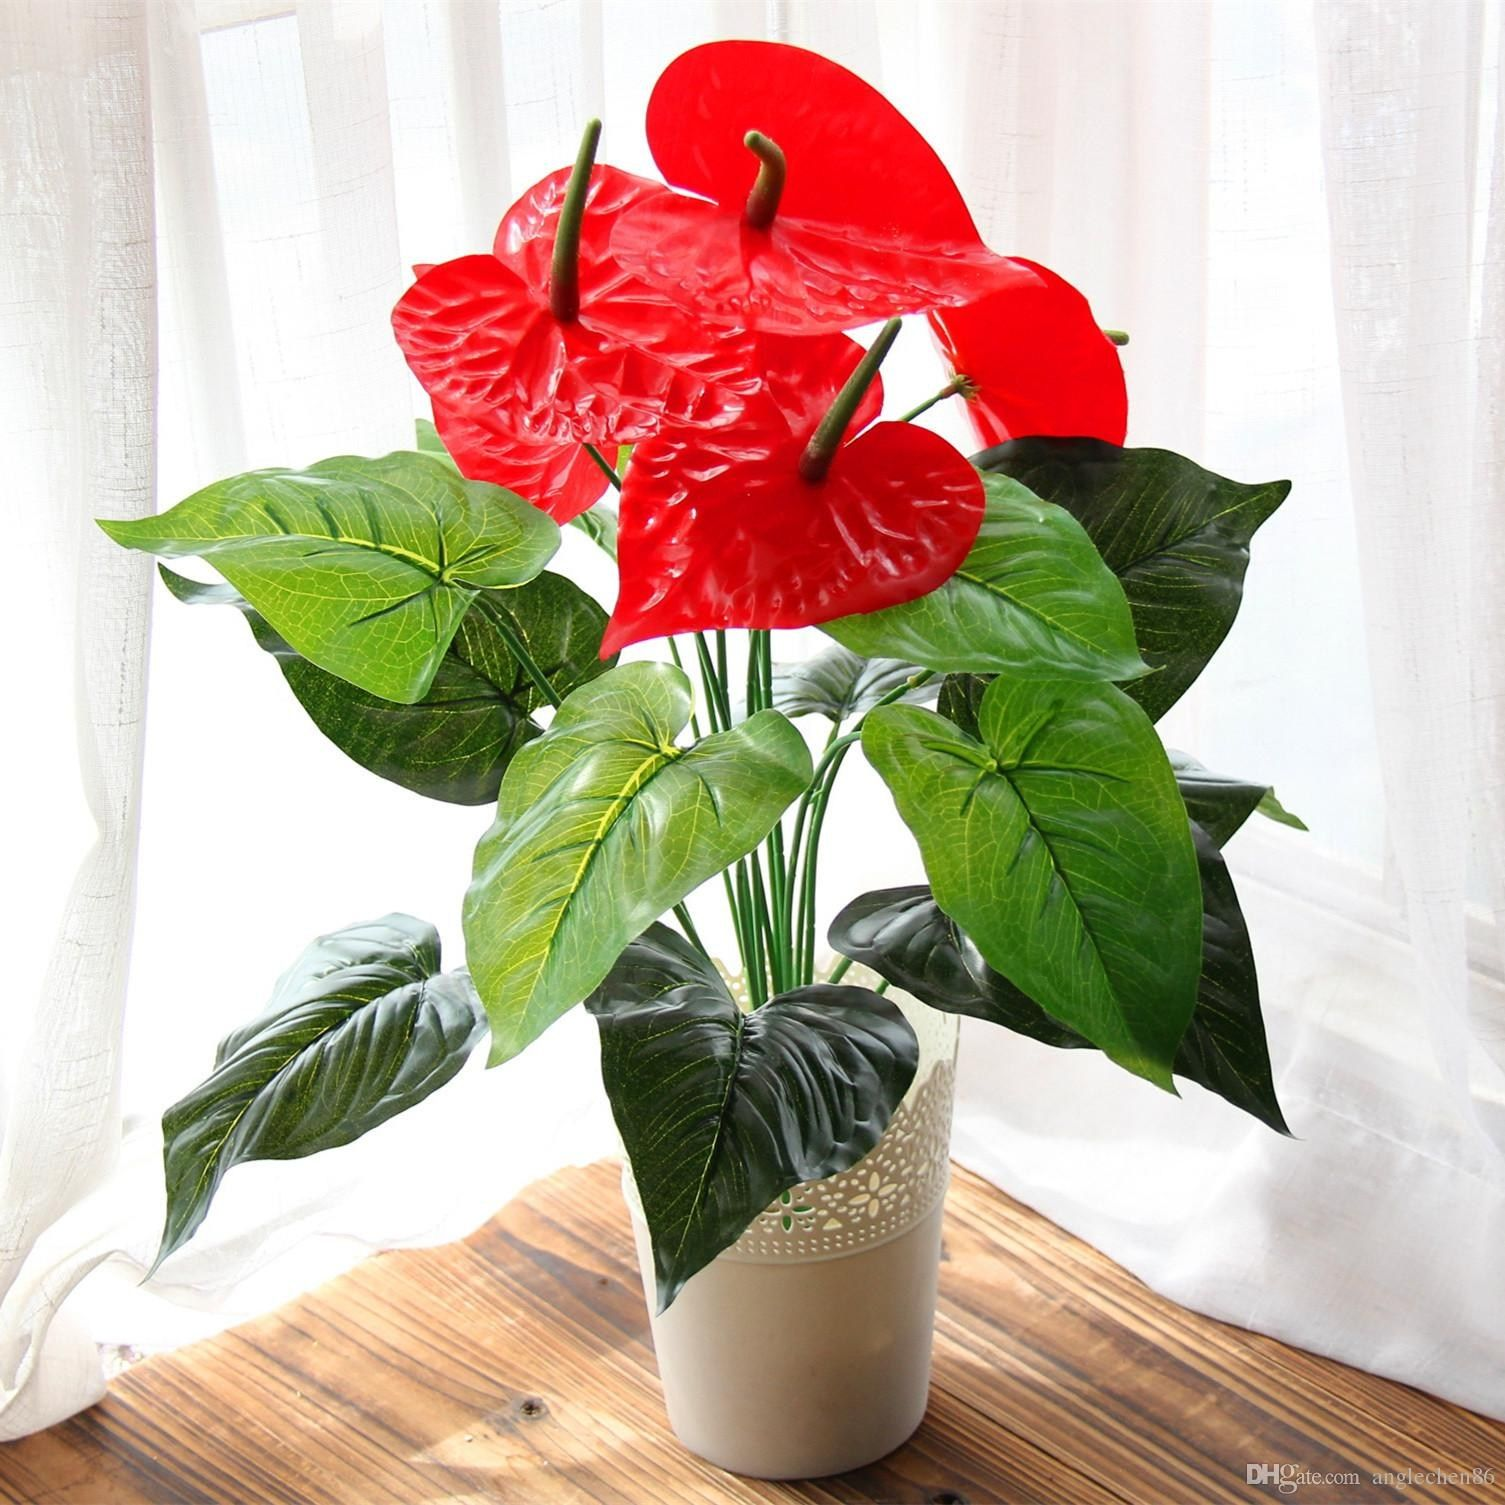 Fresh Best Place To Buy Bonsai Trees Online Images Anthurium Bouquet Silk Flower Bouquets Small Potted Plants